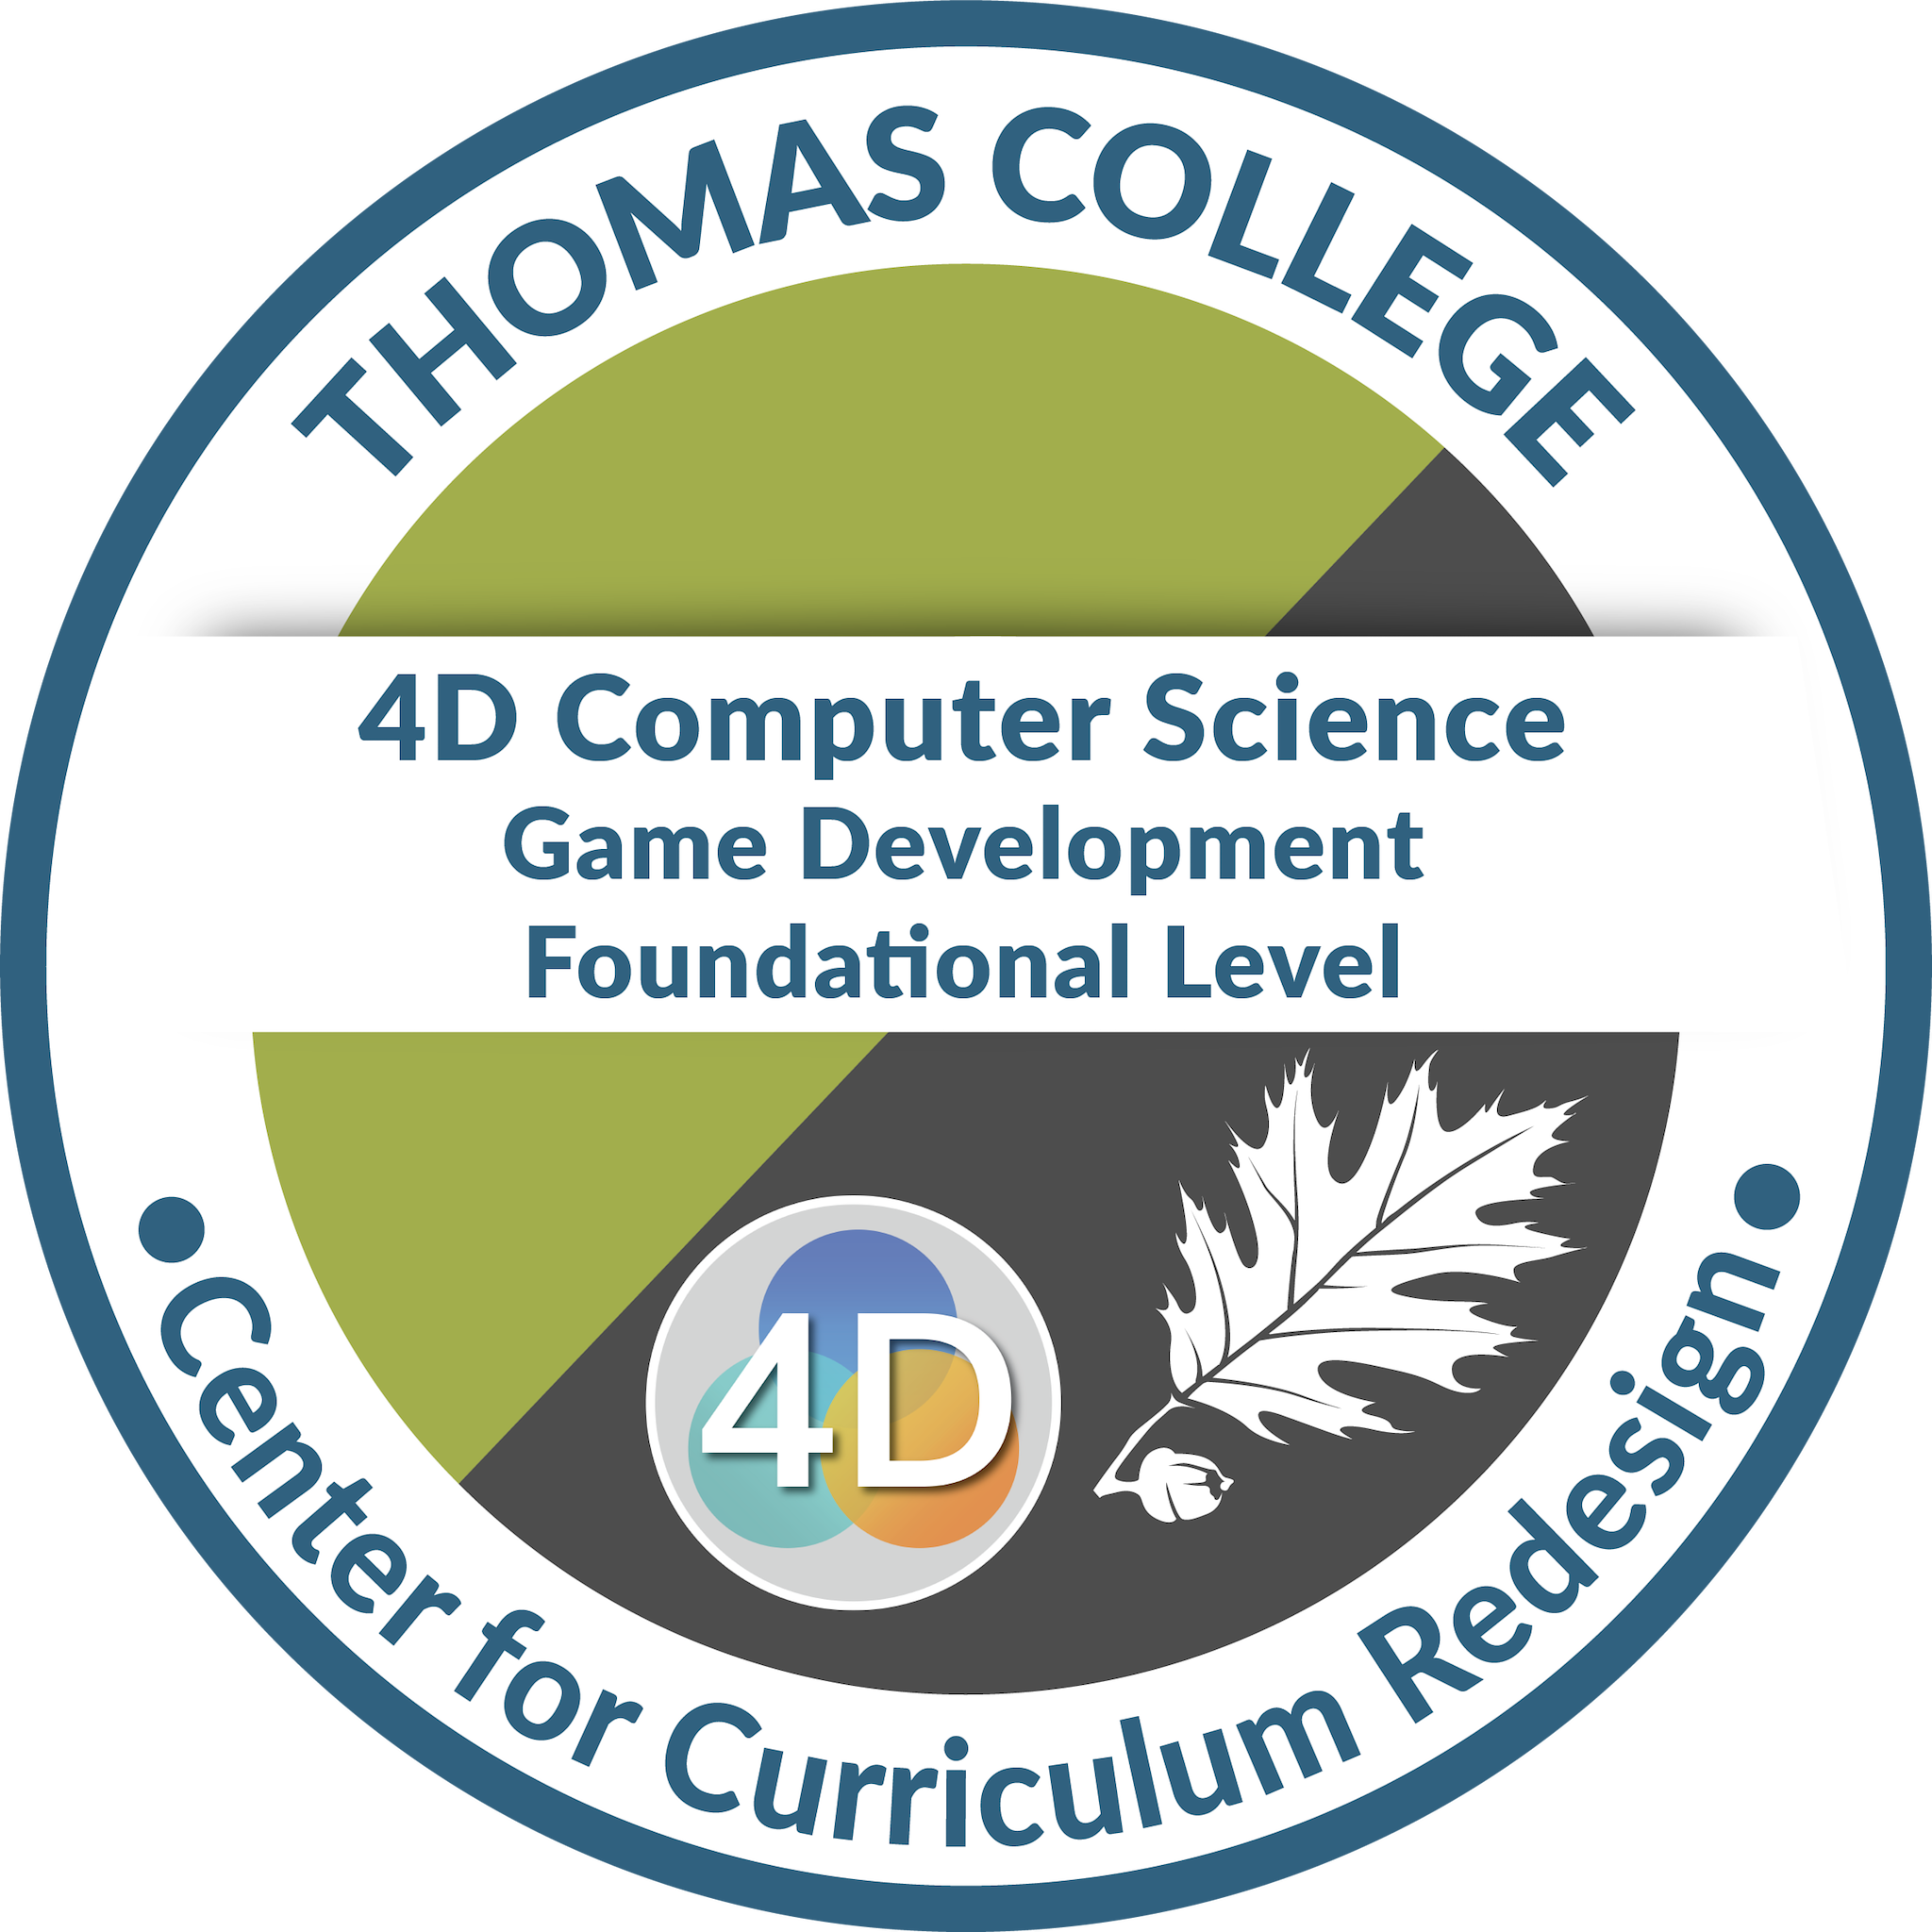 4D Computer Science: Game Development